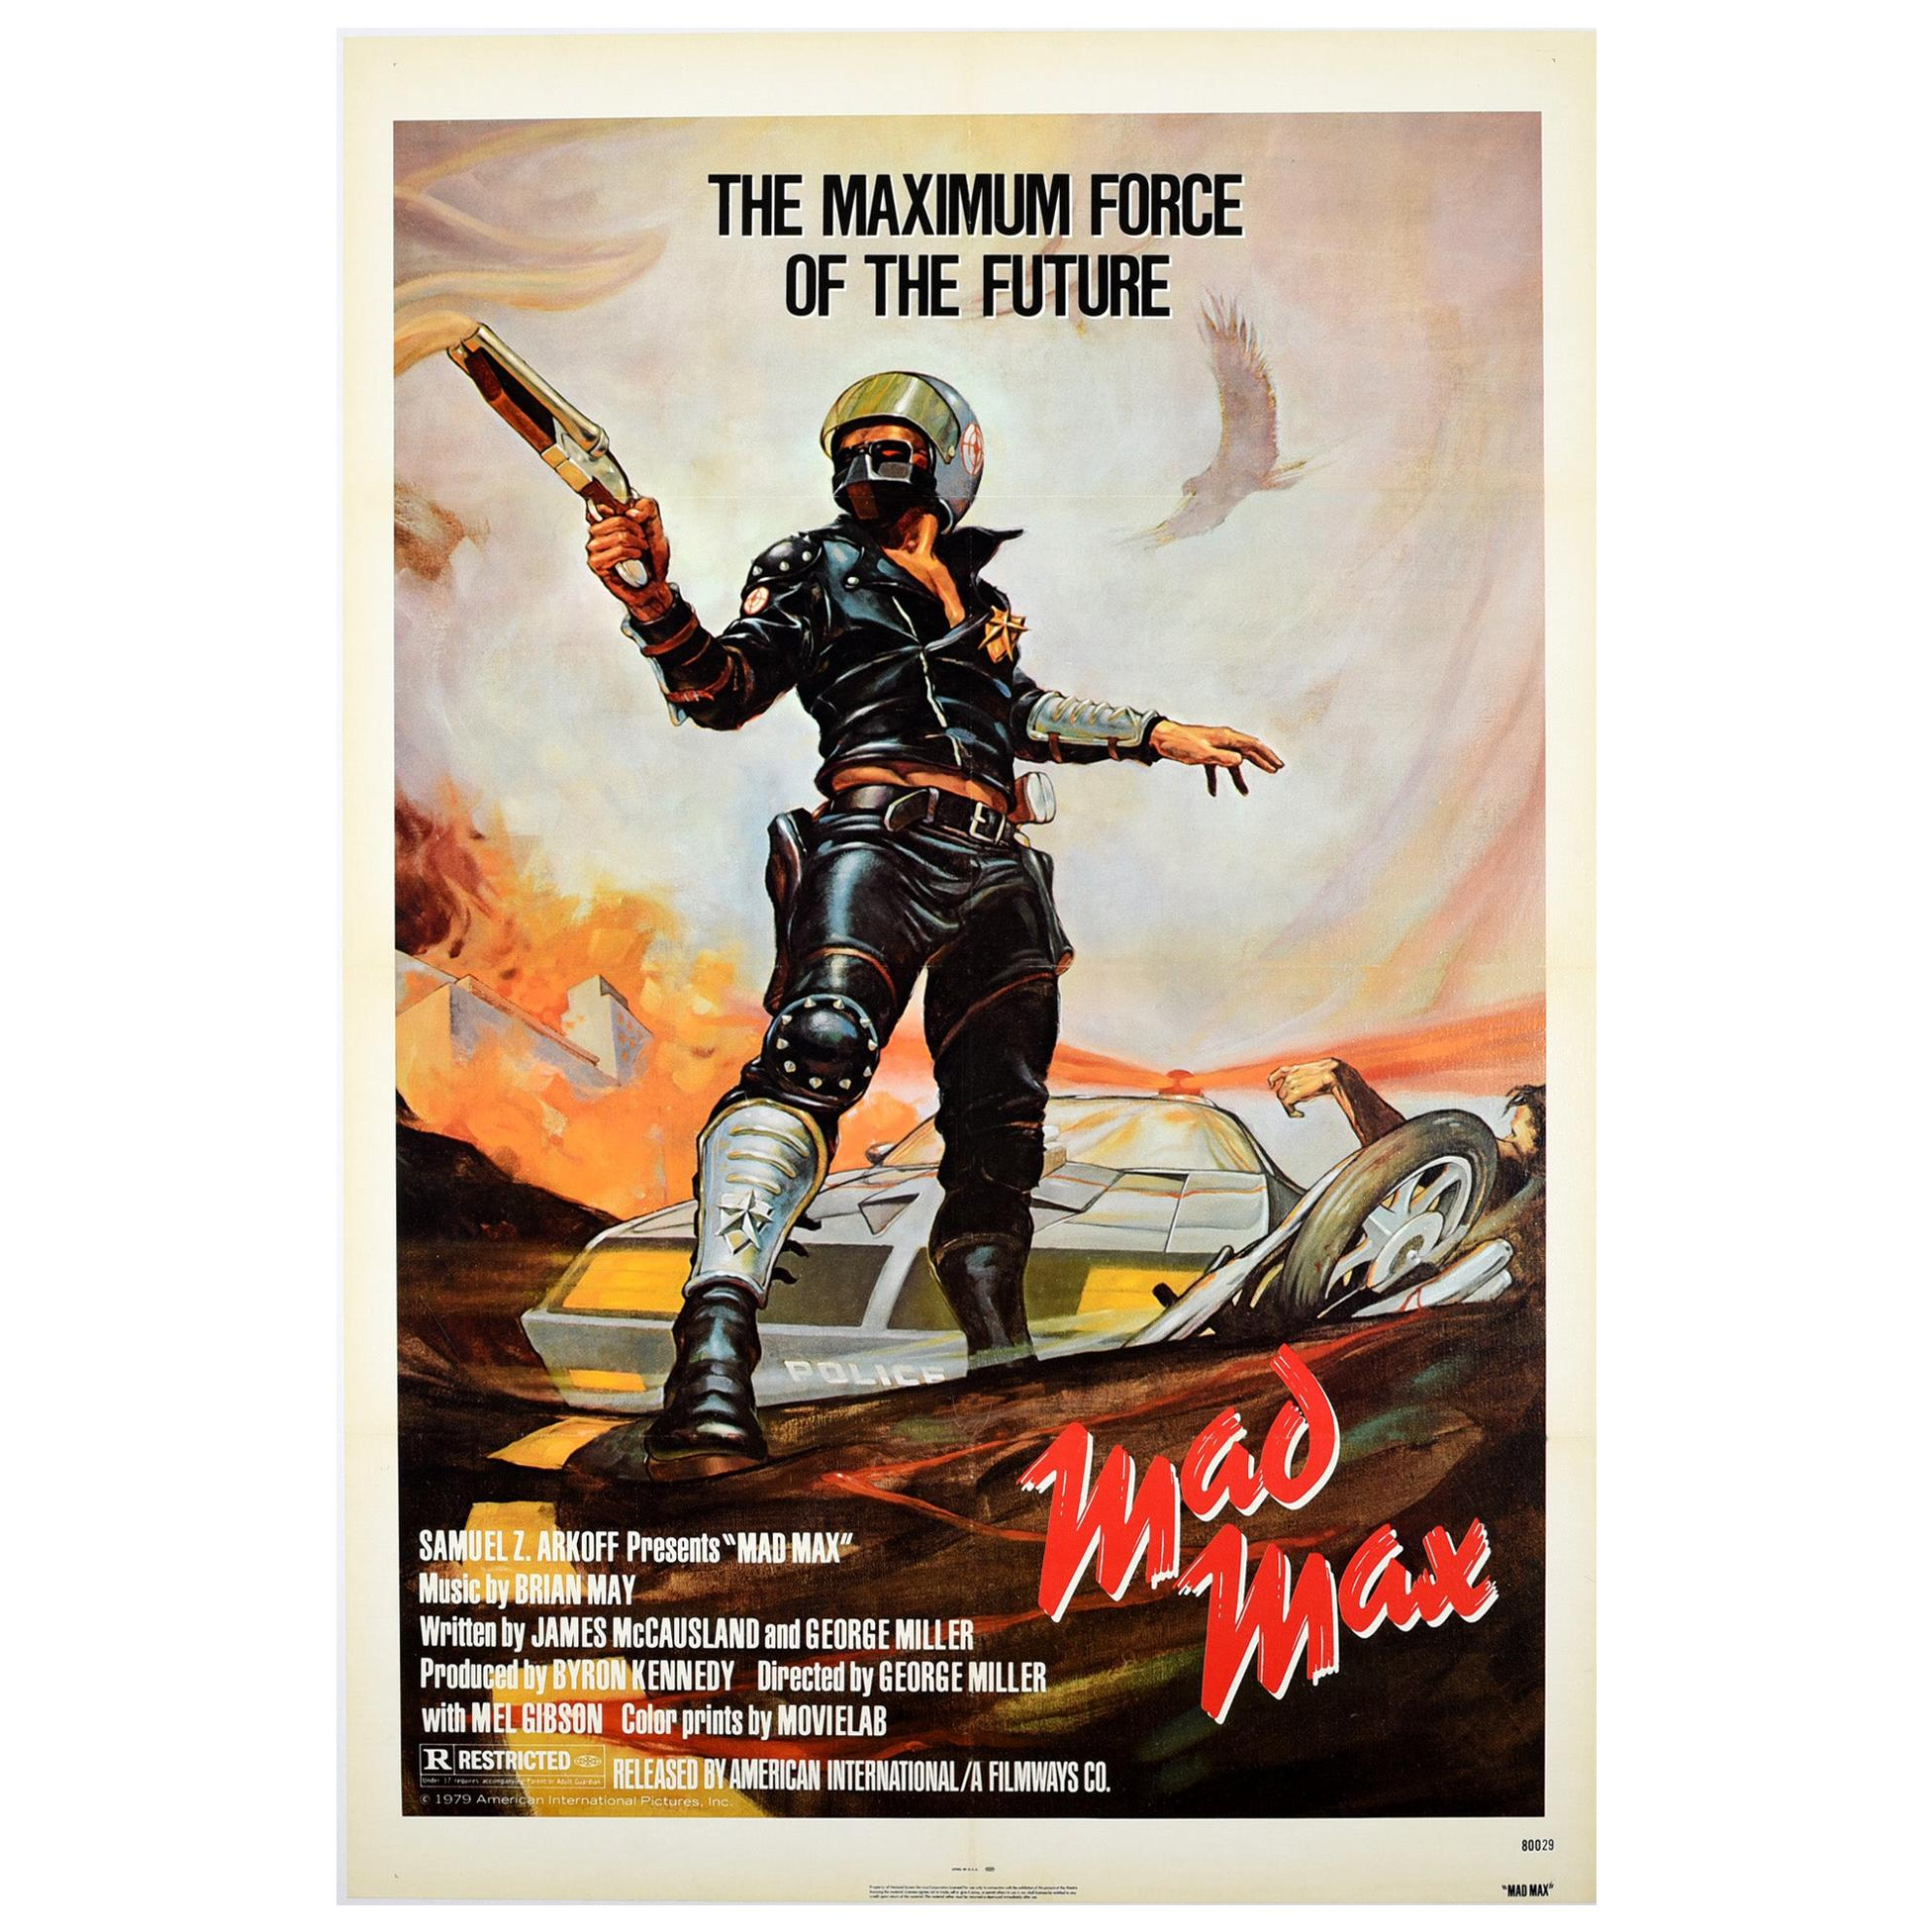 Original Vintage Poster For Mad Max Cult Movie Futuristic Sci-Fi Film Mel Gibson